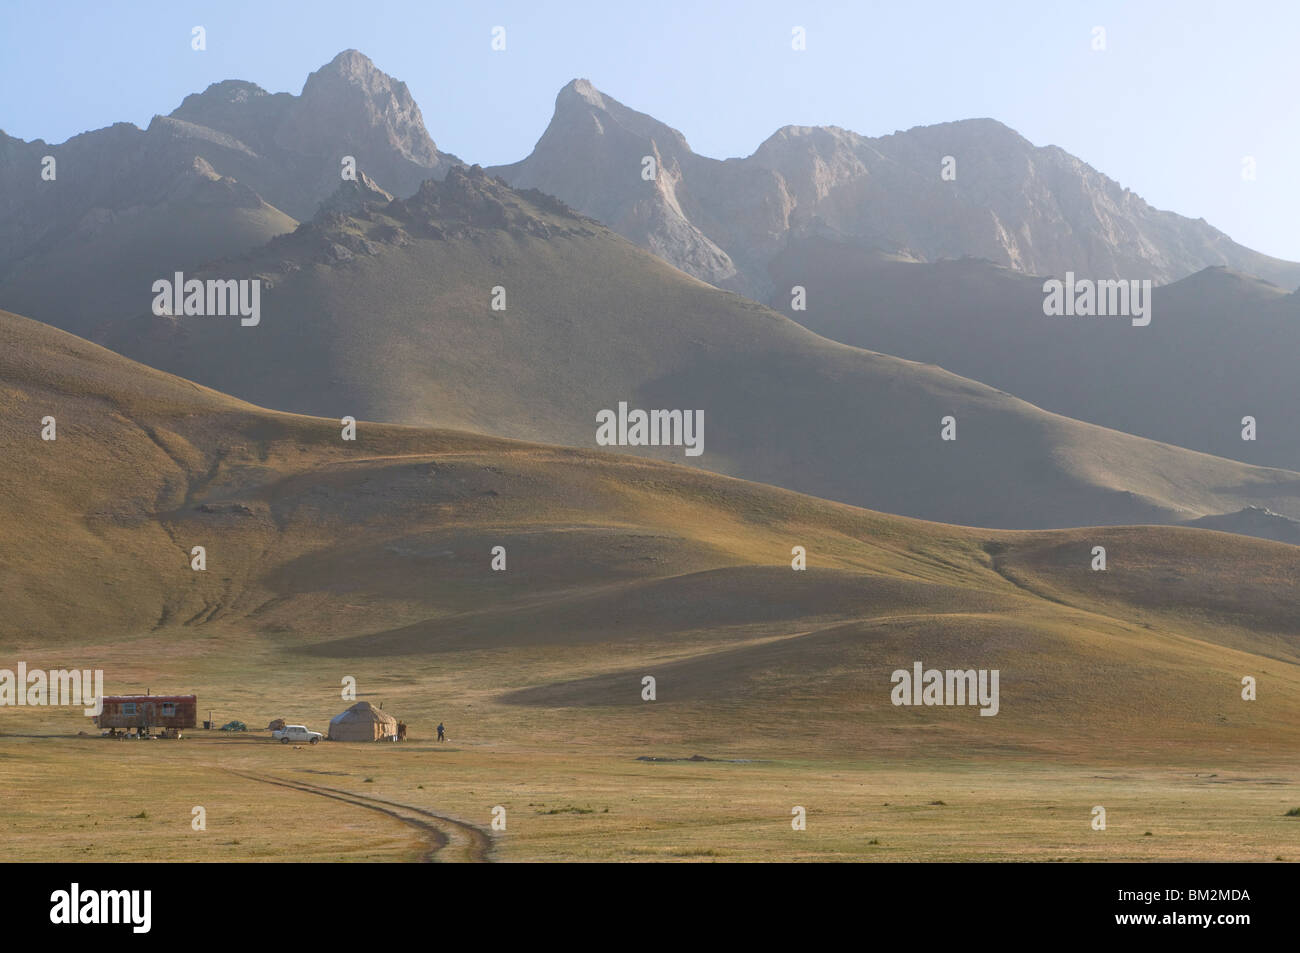 Mountains near Sary Tash, Kyrgyzstan - Stock Image